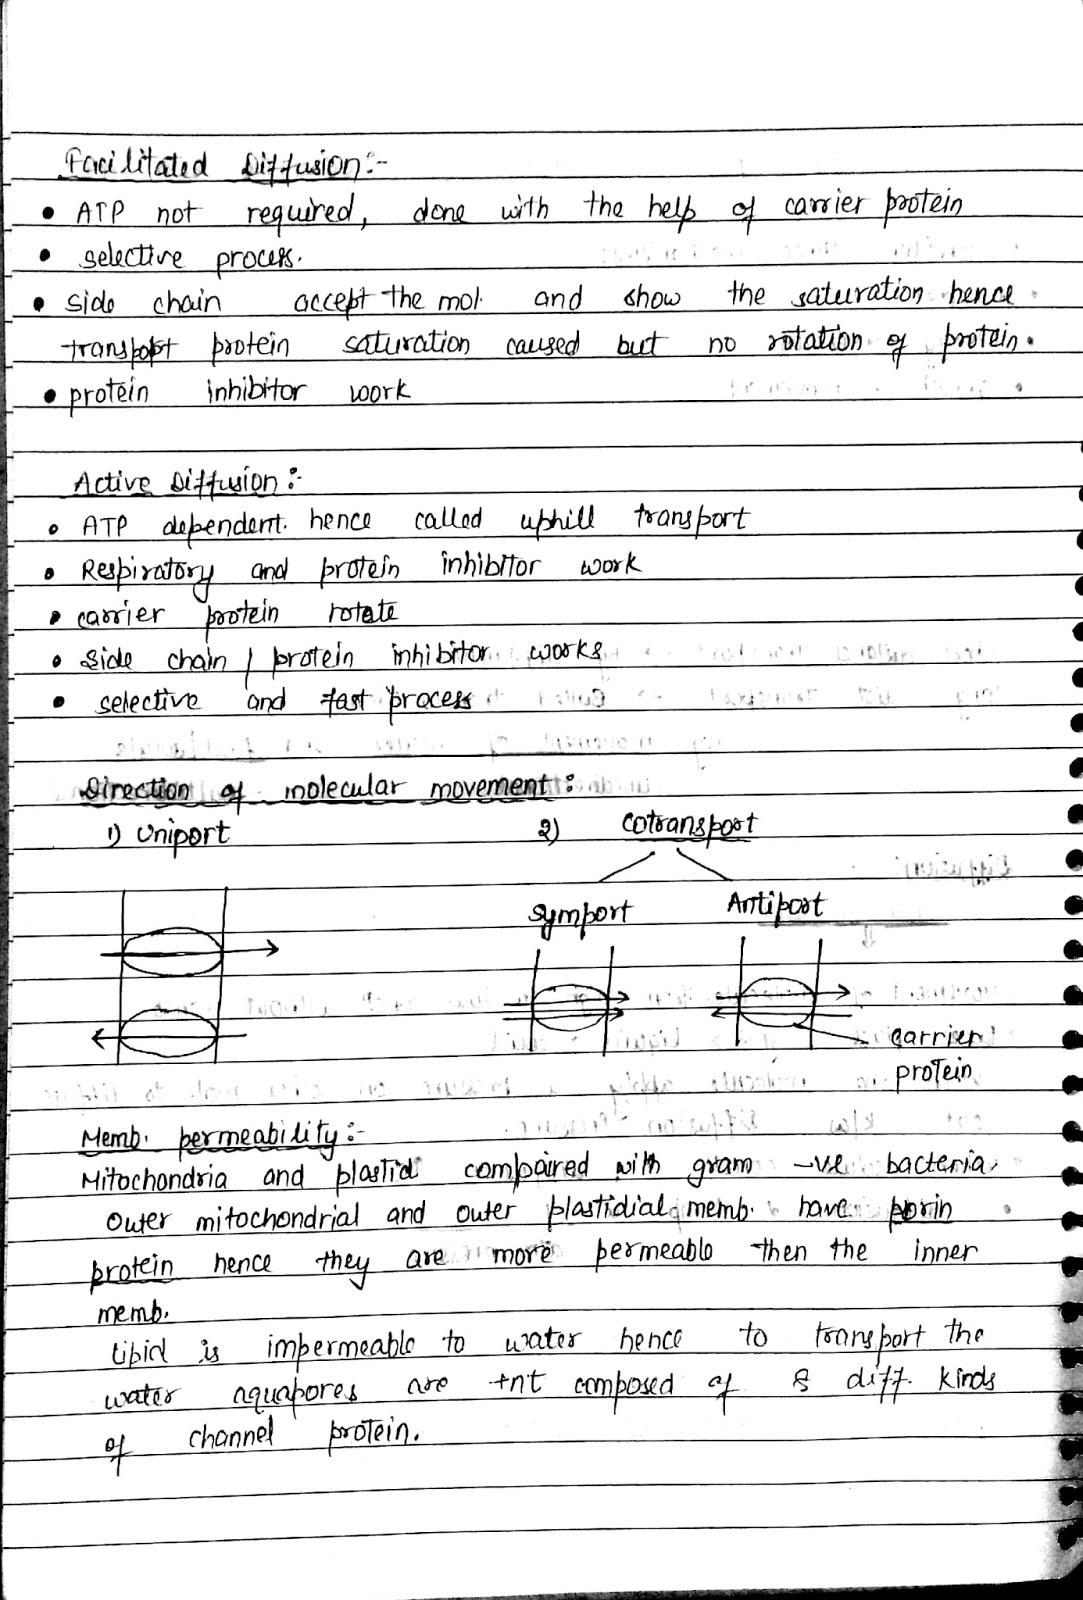 06 Plant transport - Biology Notes for IGCSE